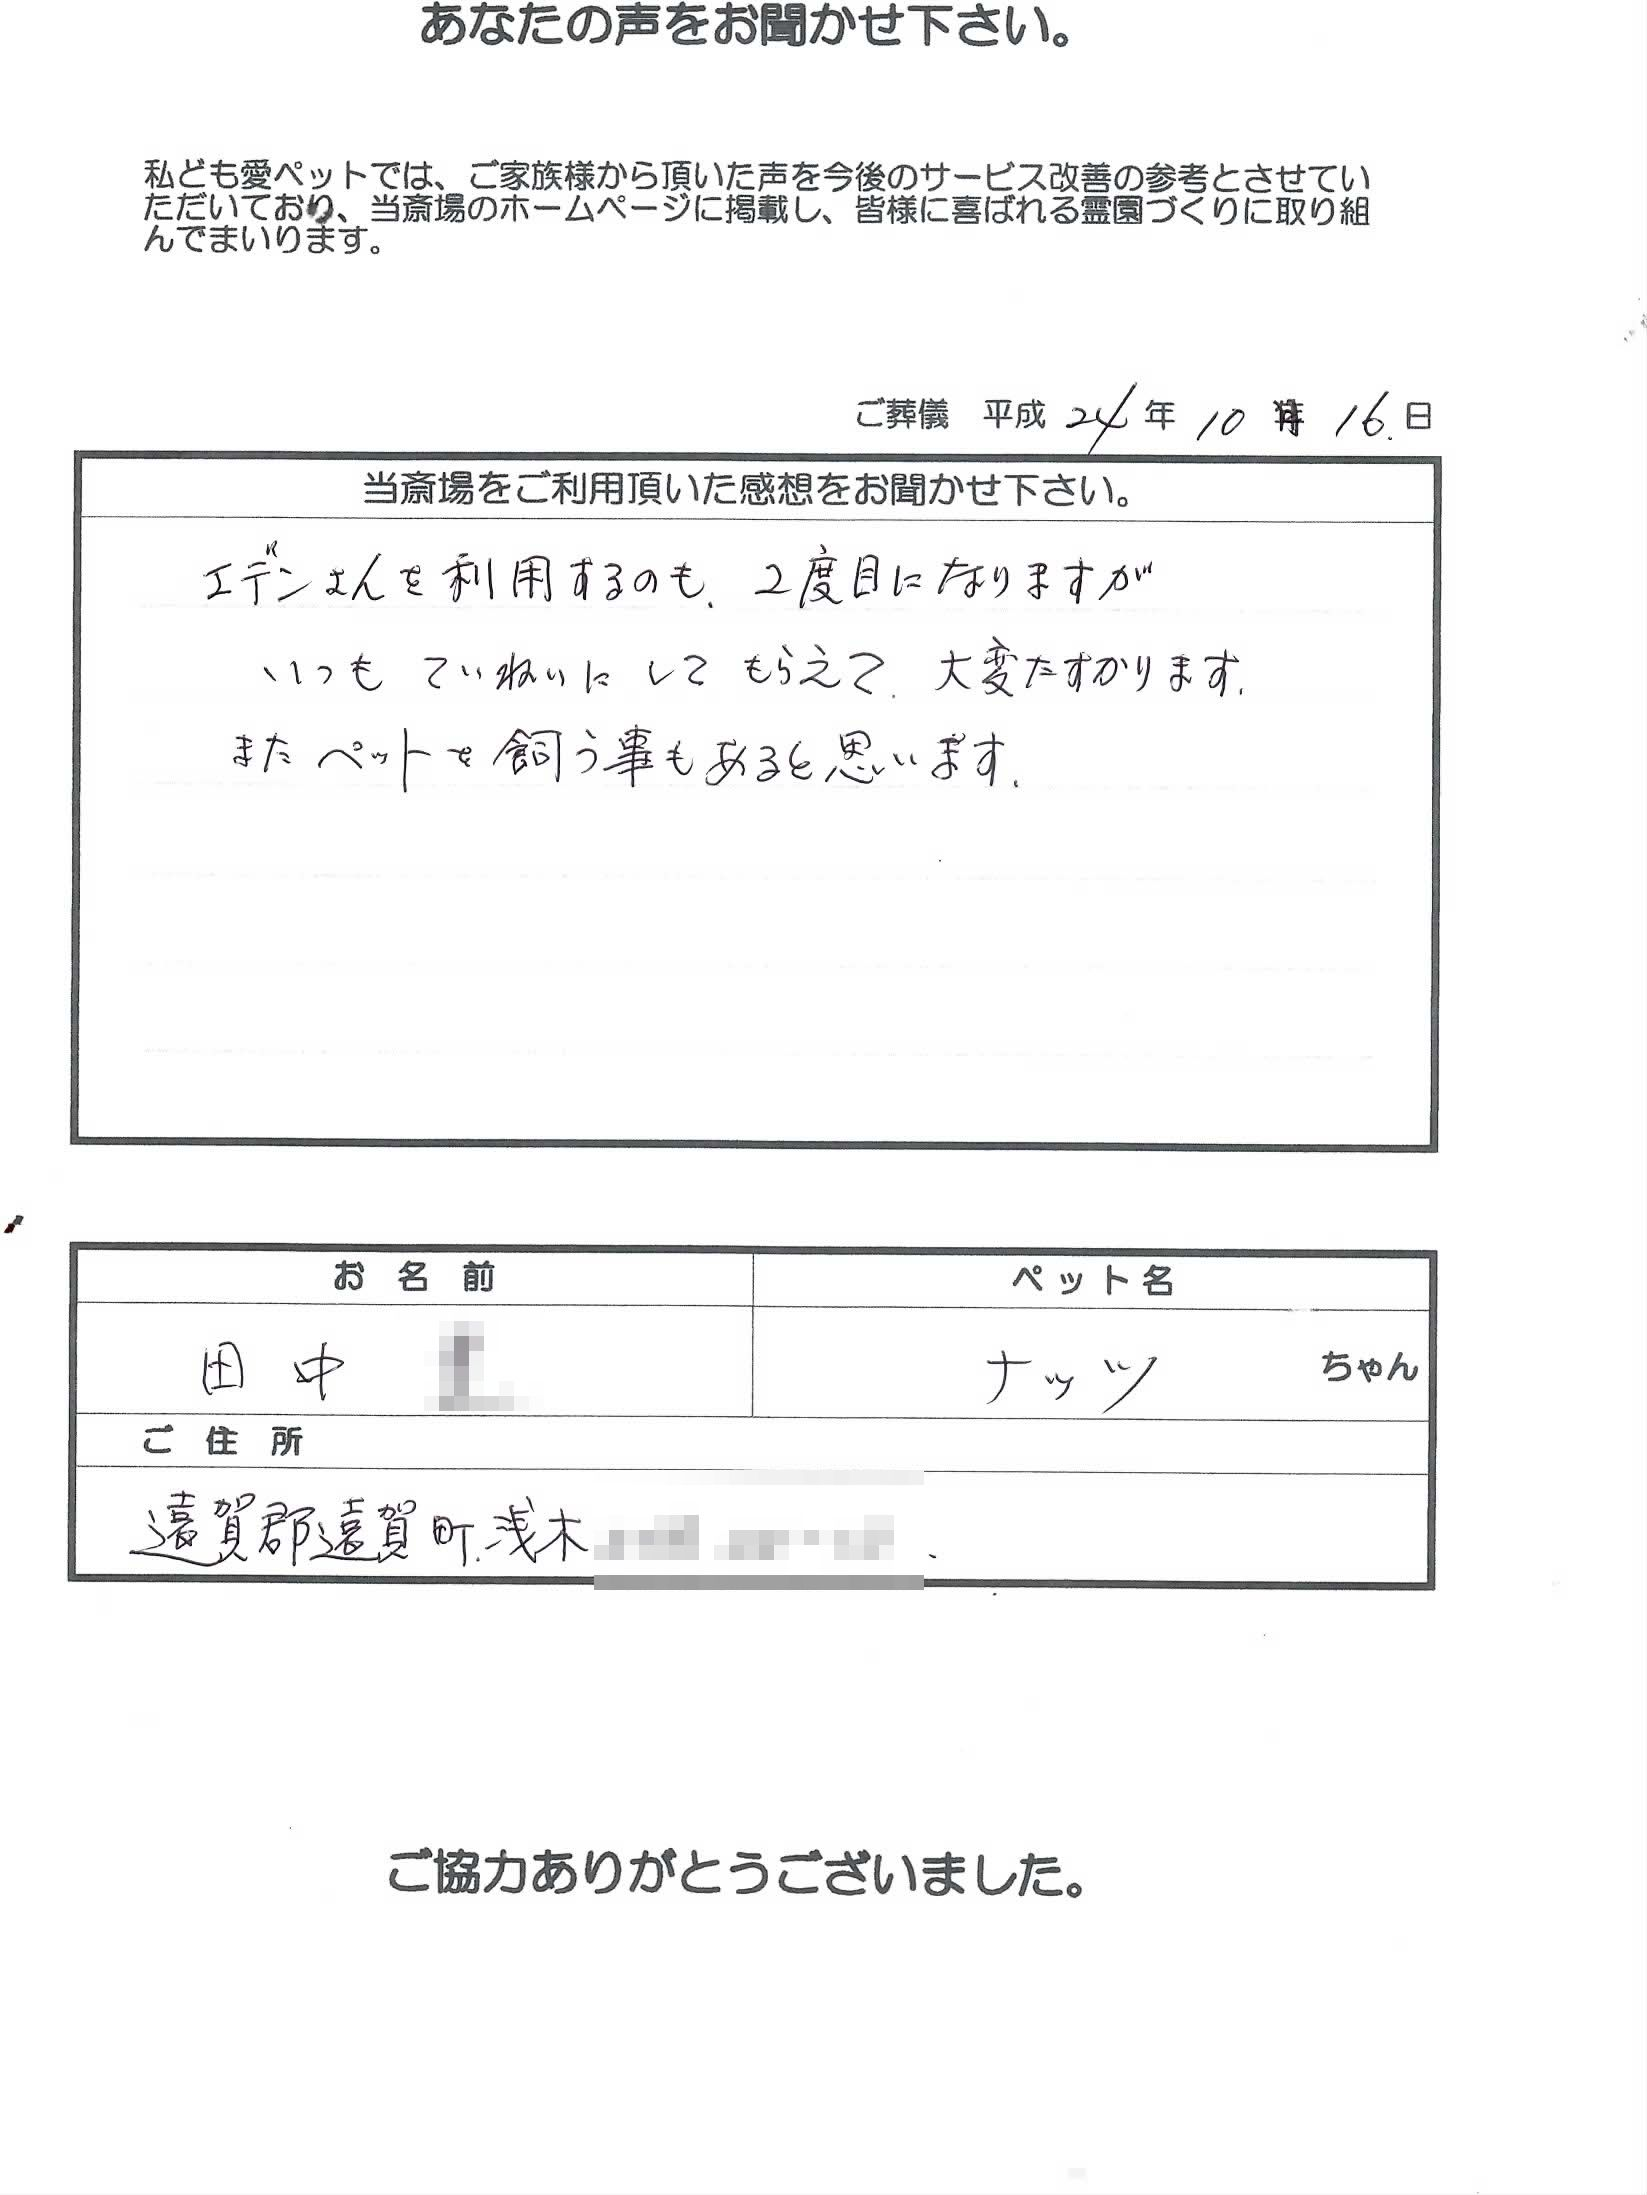 k121016-1.jpg